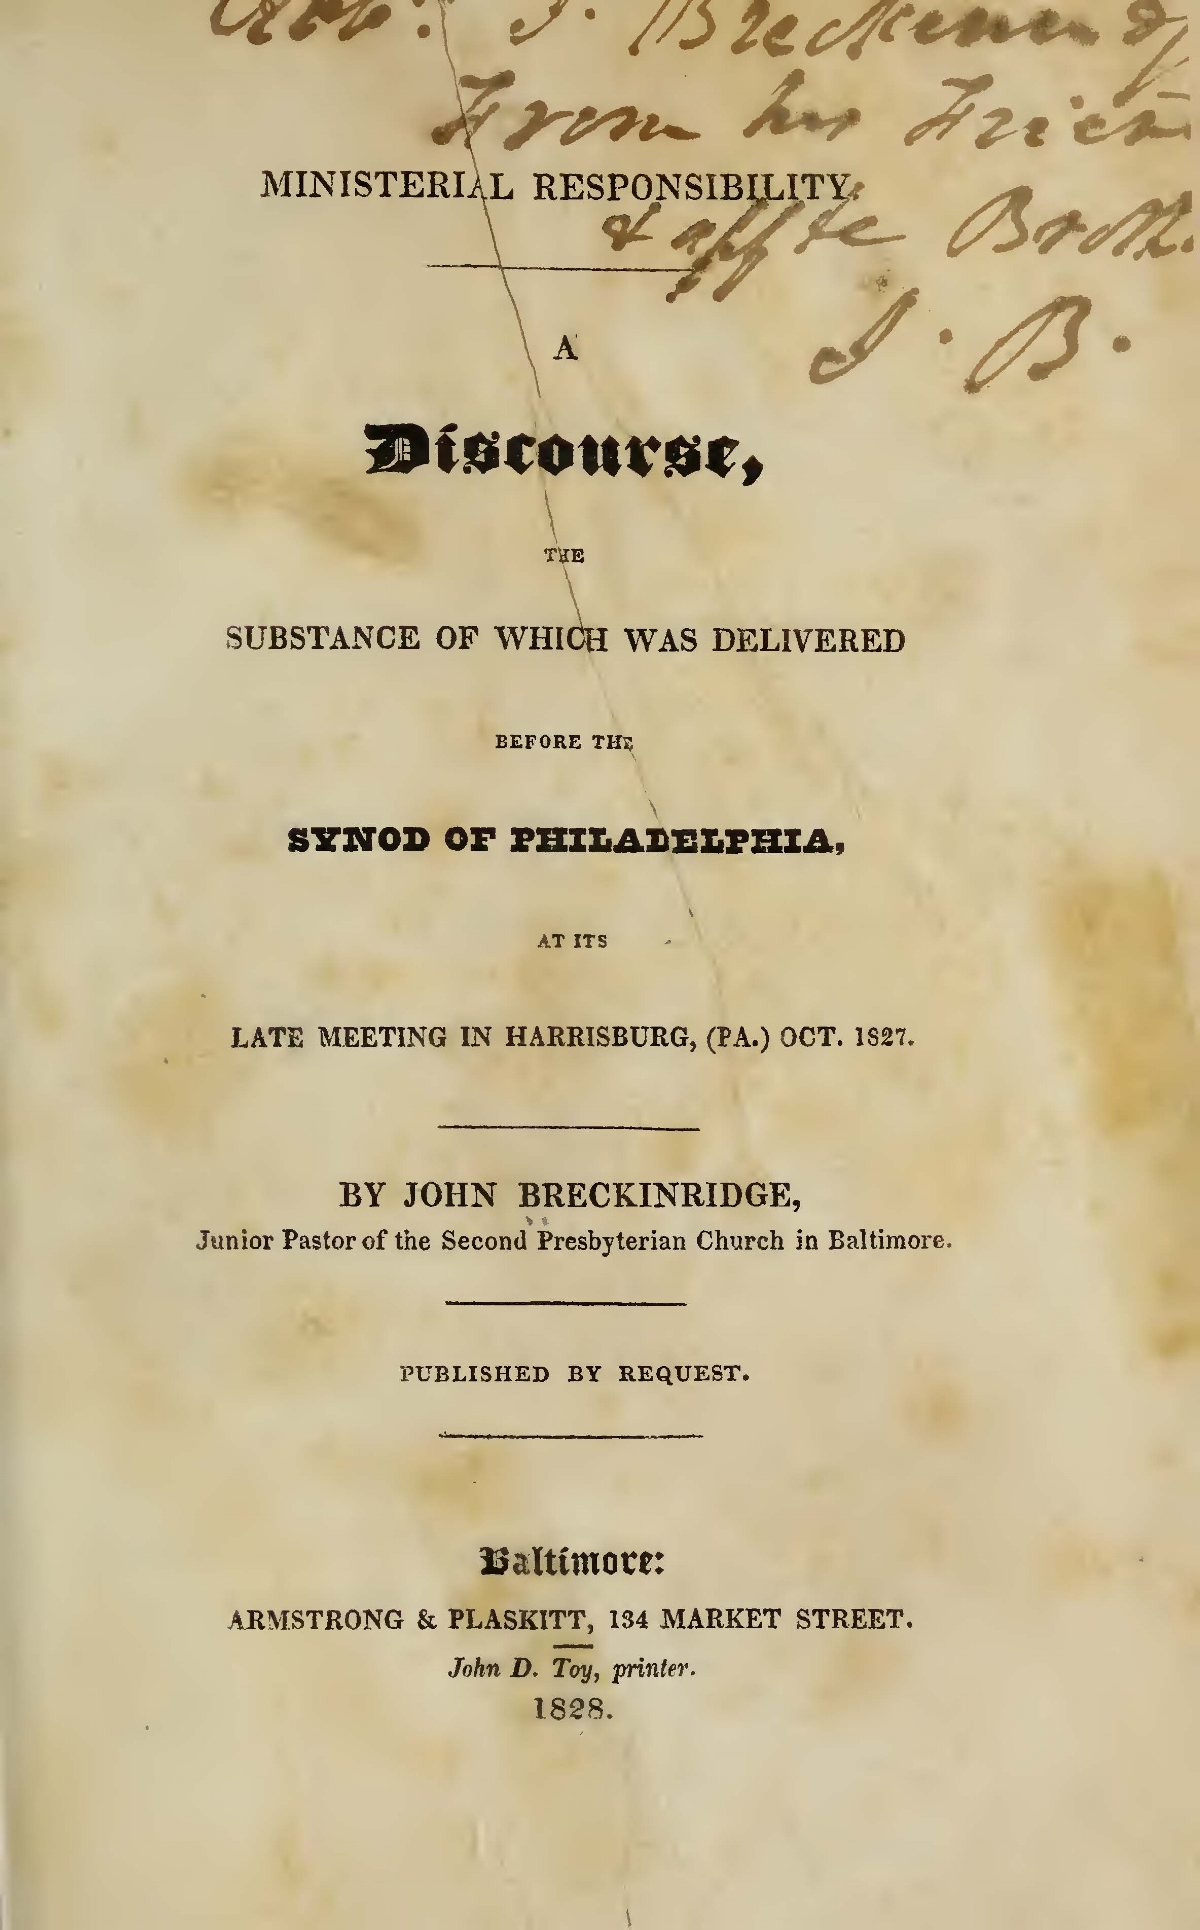 Breckinridge, John, Ministerial Responsibility Title Page.jpg